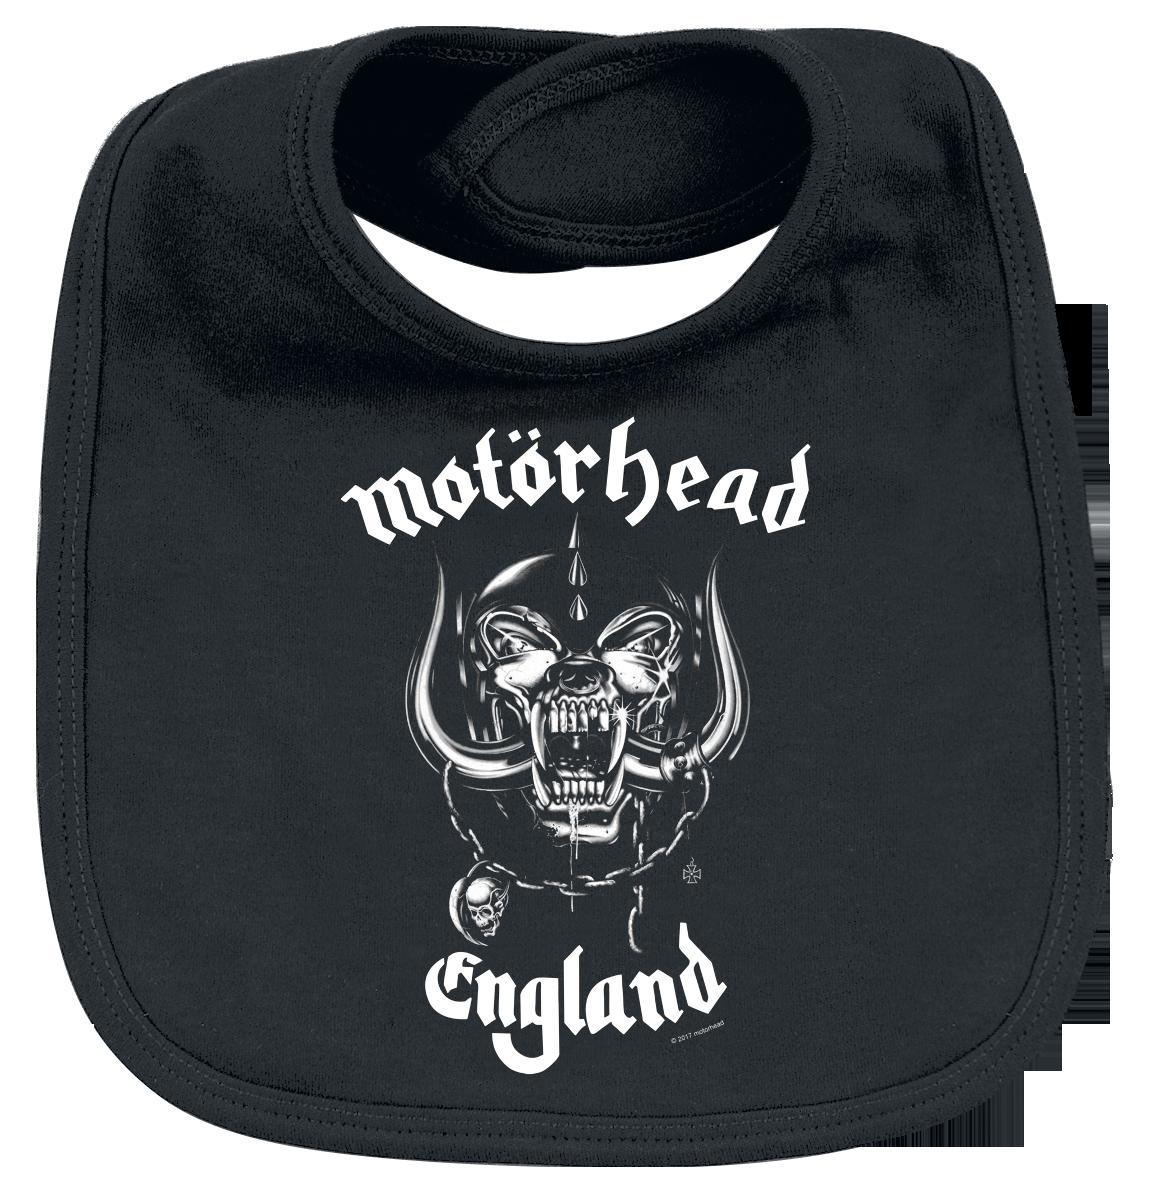 Motörhead - England - Lätzchen - schwarz